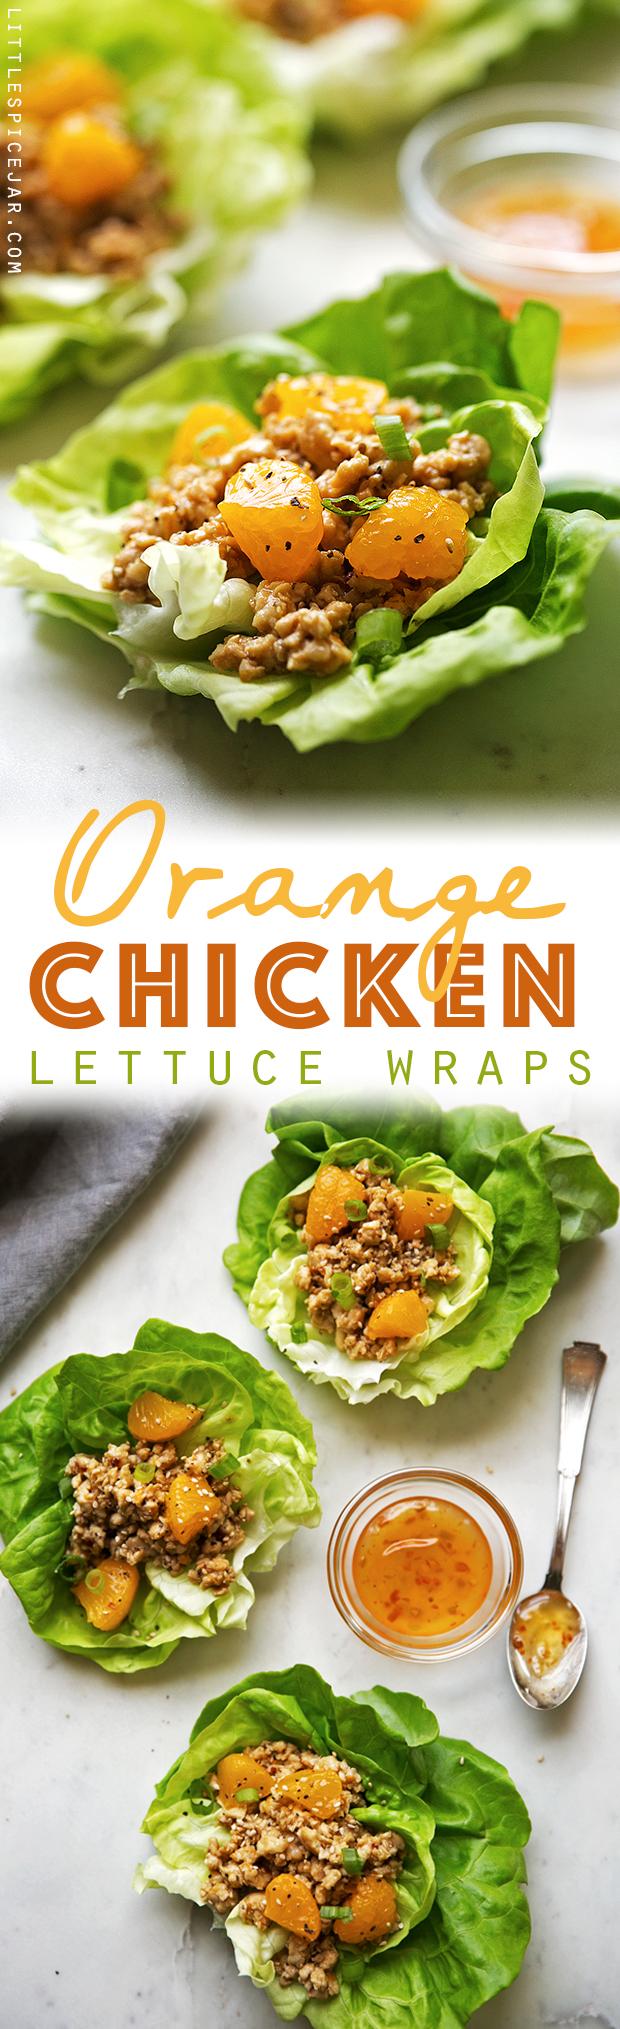 ... lettuce wraps wraps five spice pork wraps seven spice pork lettuce